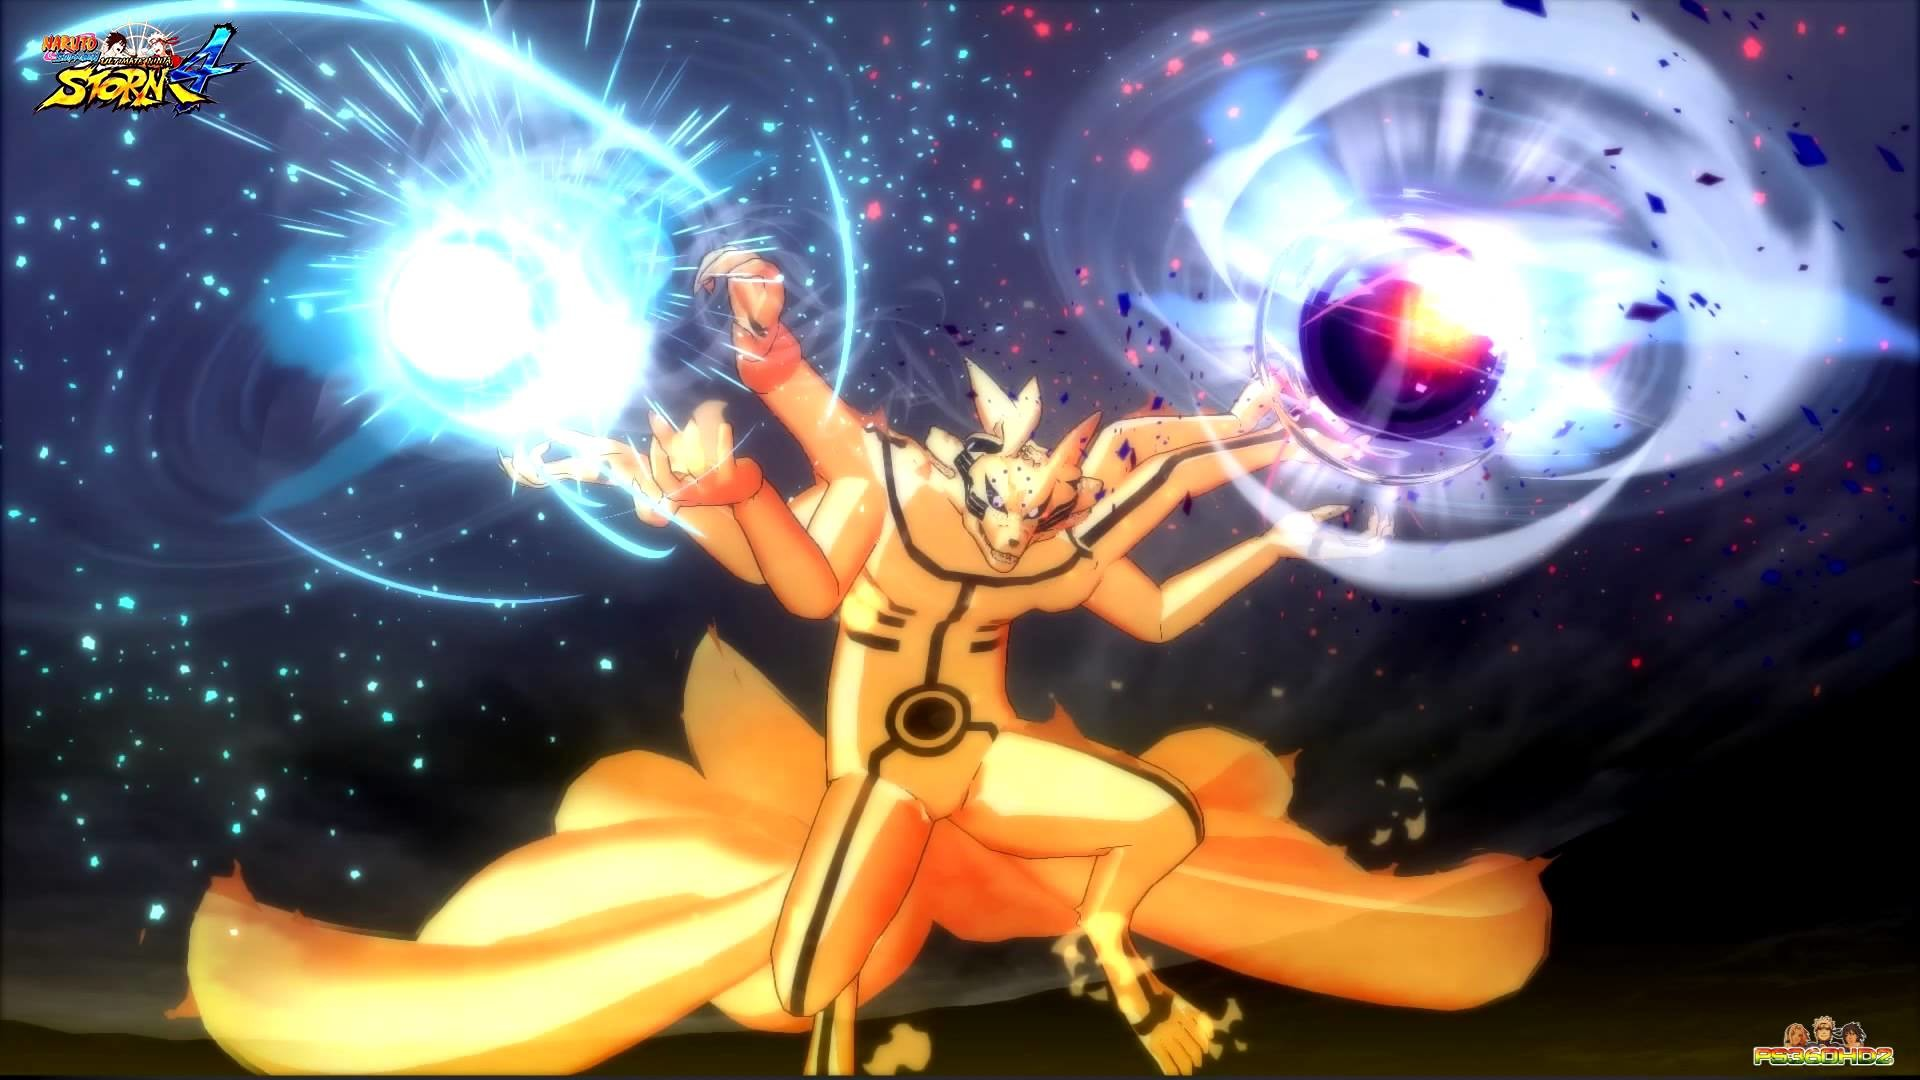 Naruto Vs Sasuke Hd Wallpaper 68 Images